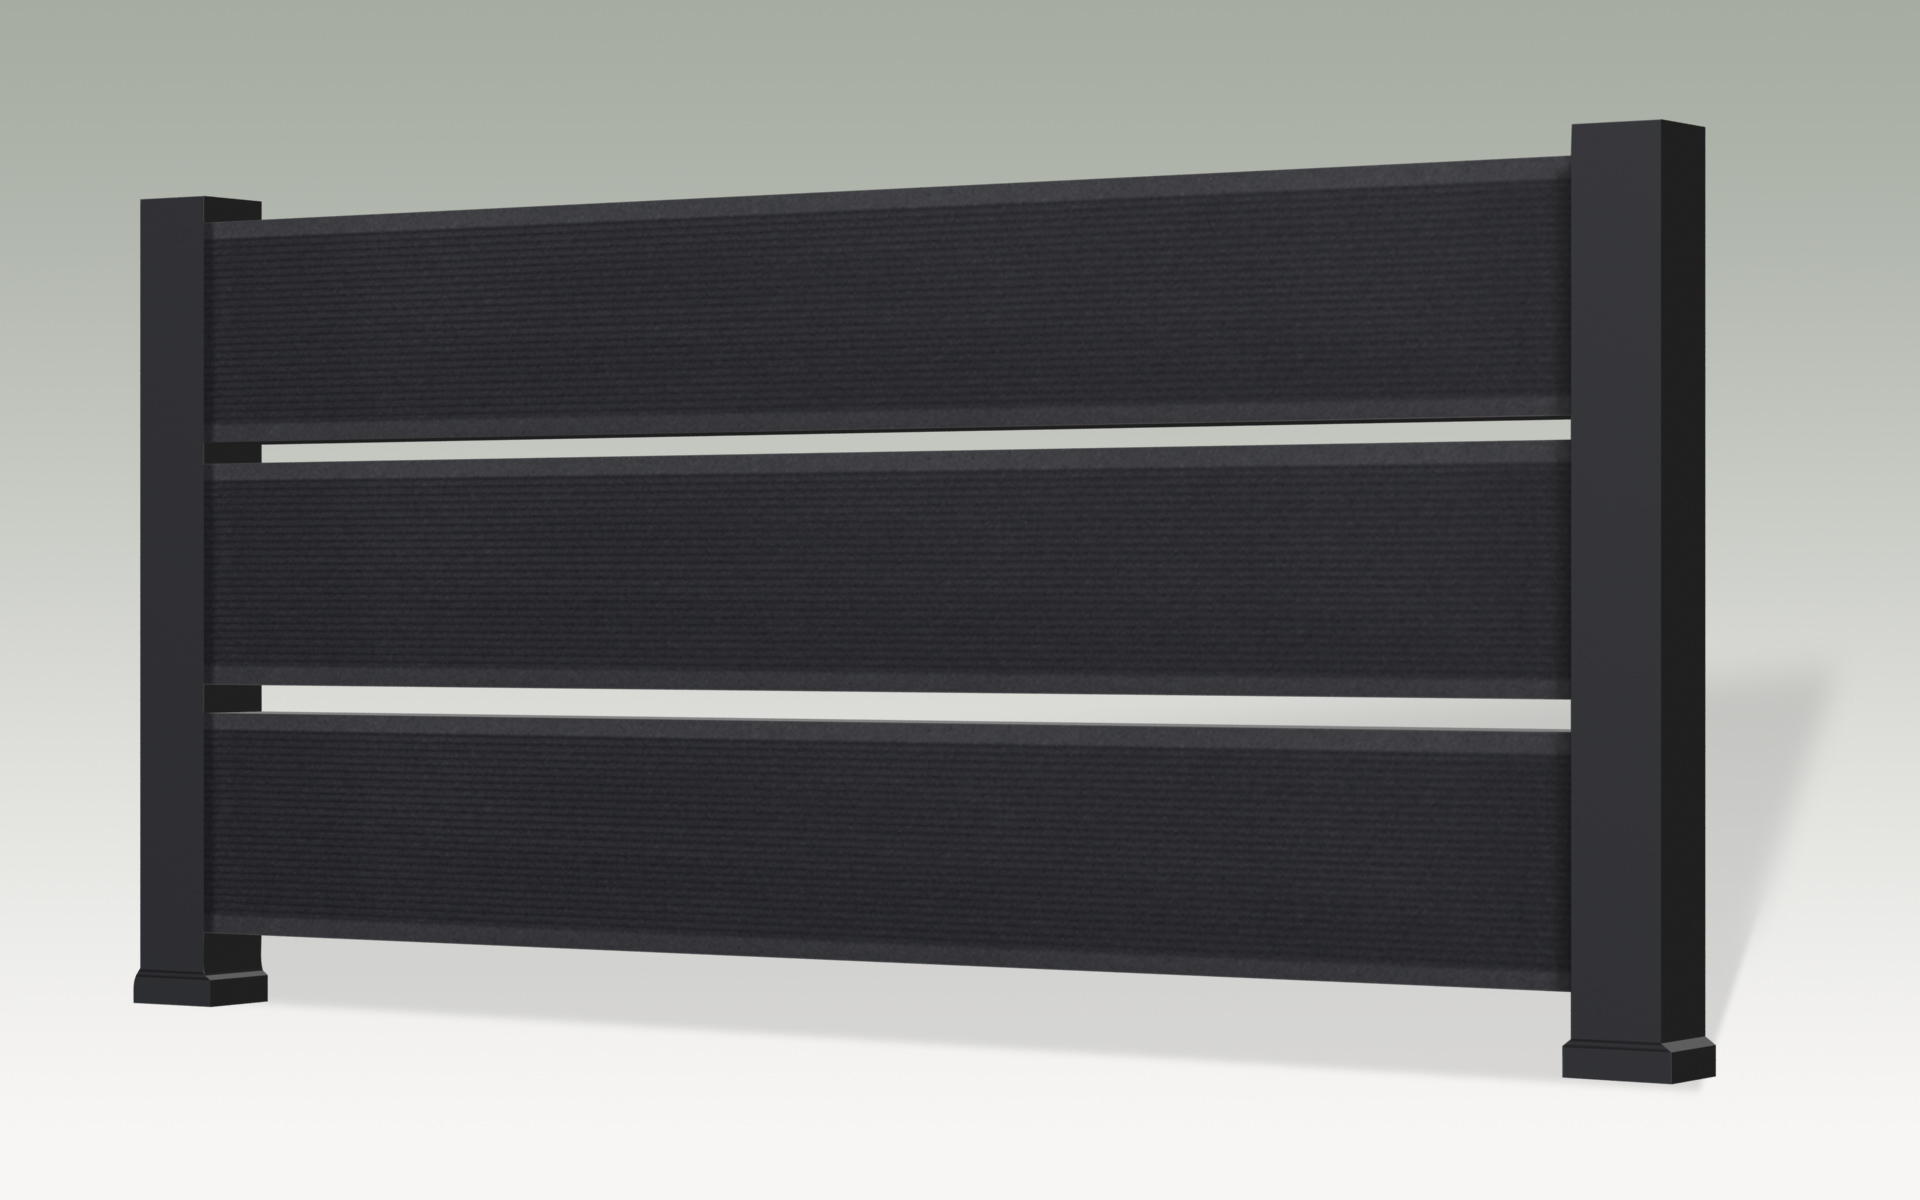 Styledoors perifraxi classic c6491